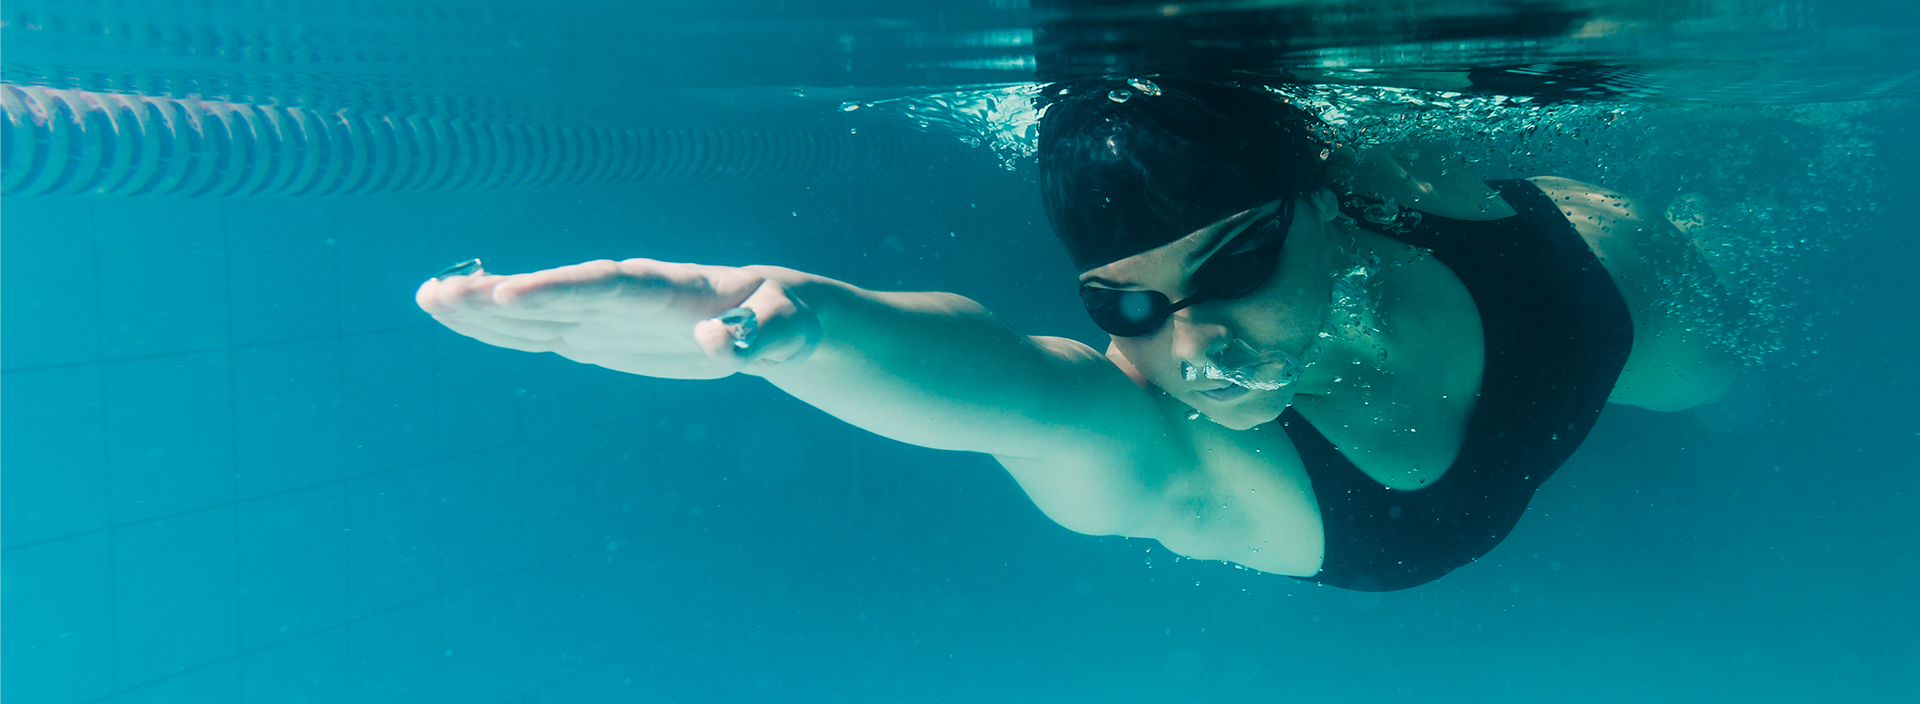 BP-cursos-natacion-21-22-inacua